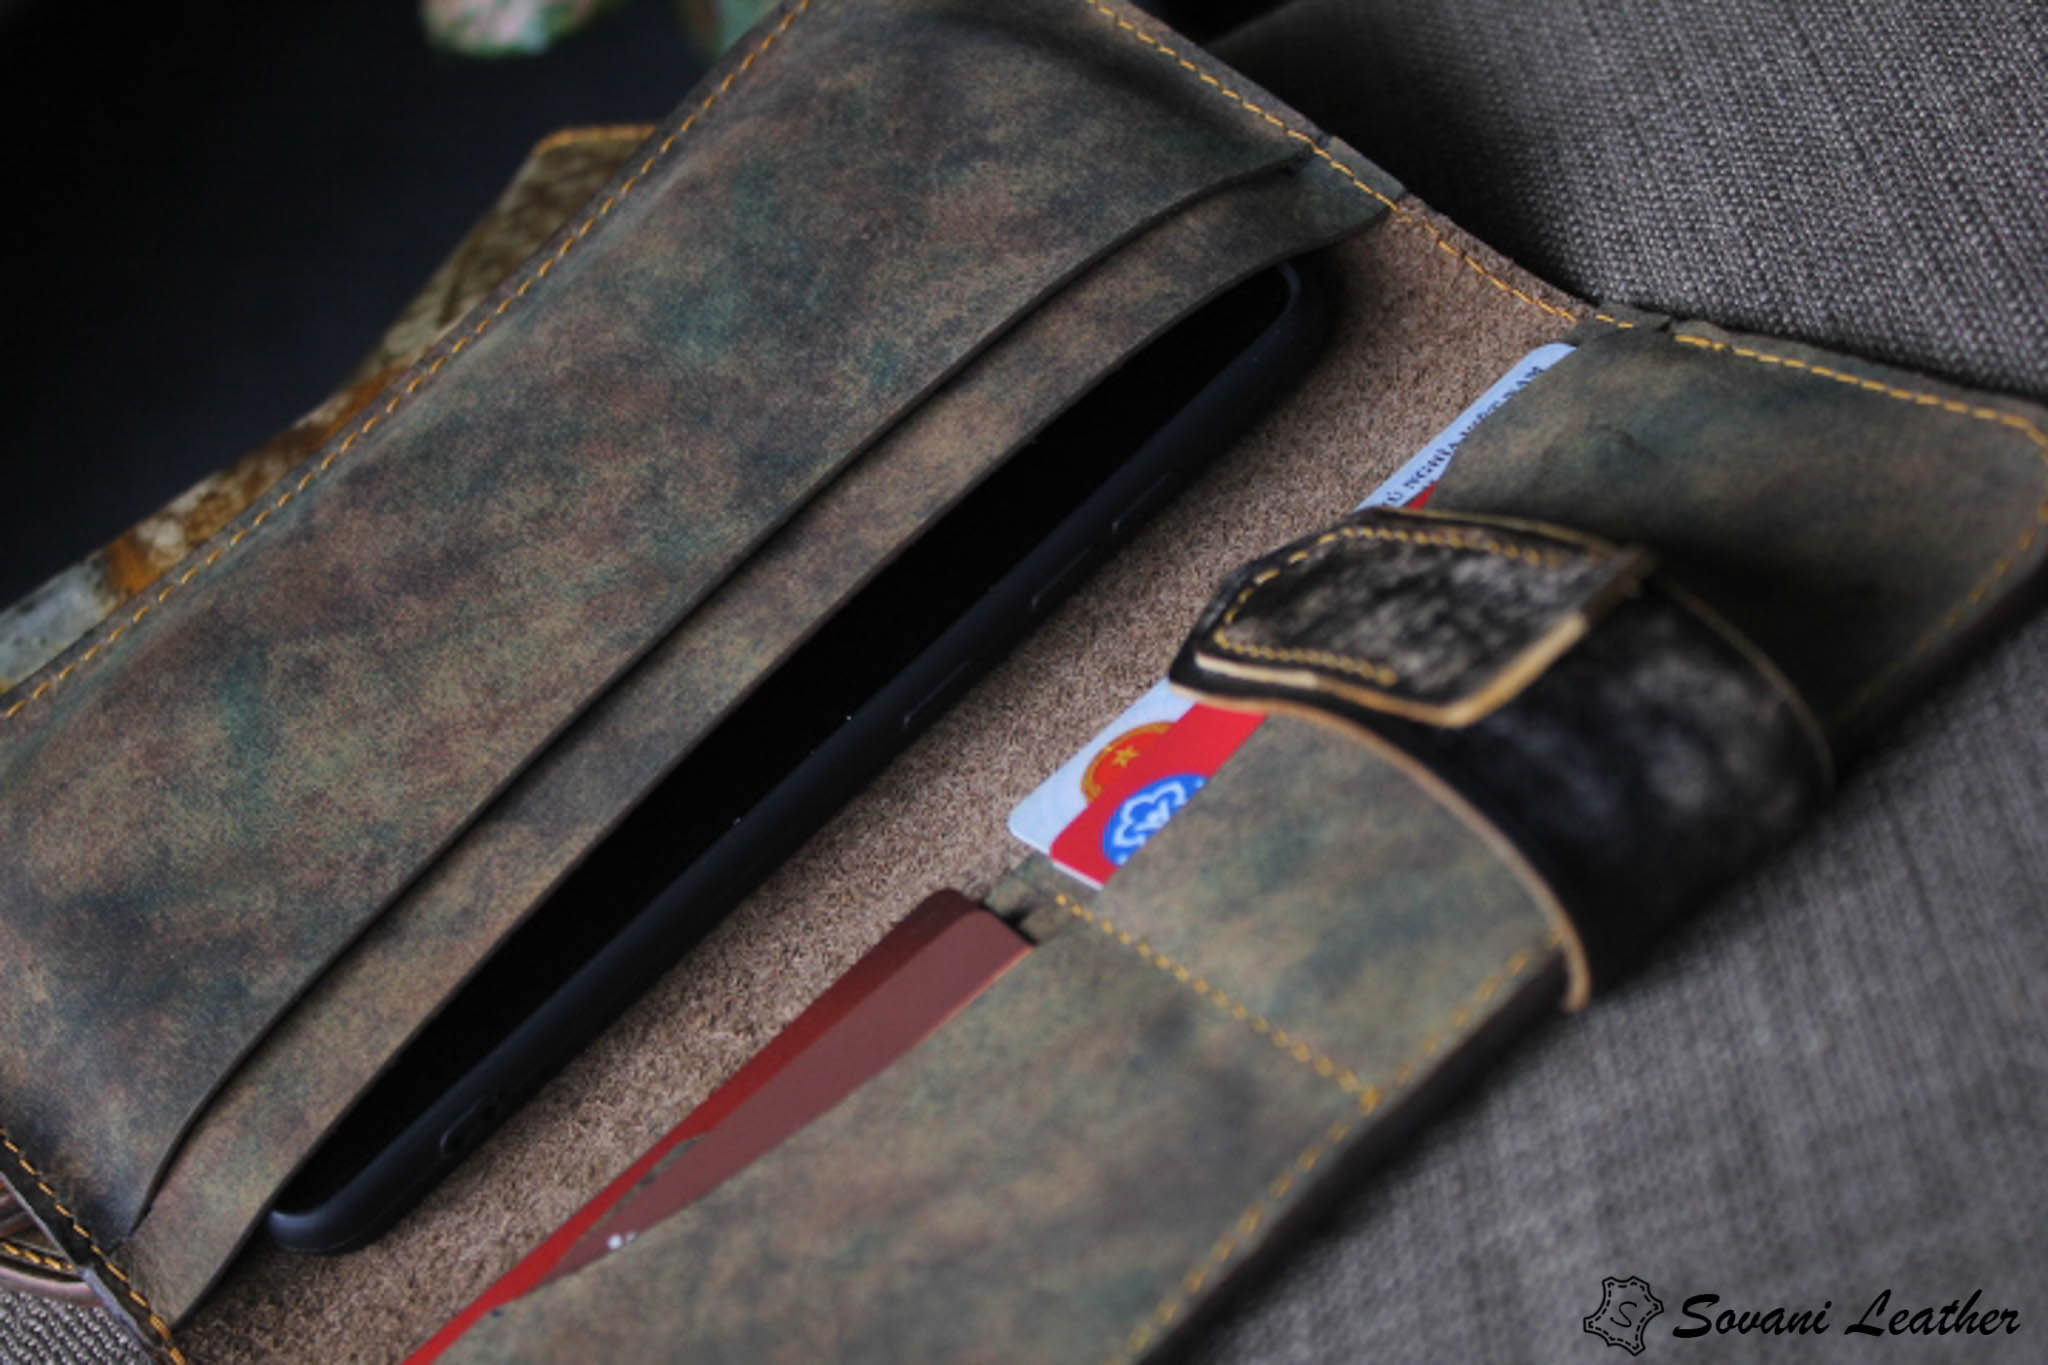 Ví cầm tay handmade cao cấp – Vegetable tan patina 22